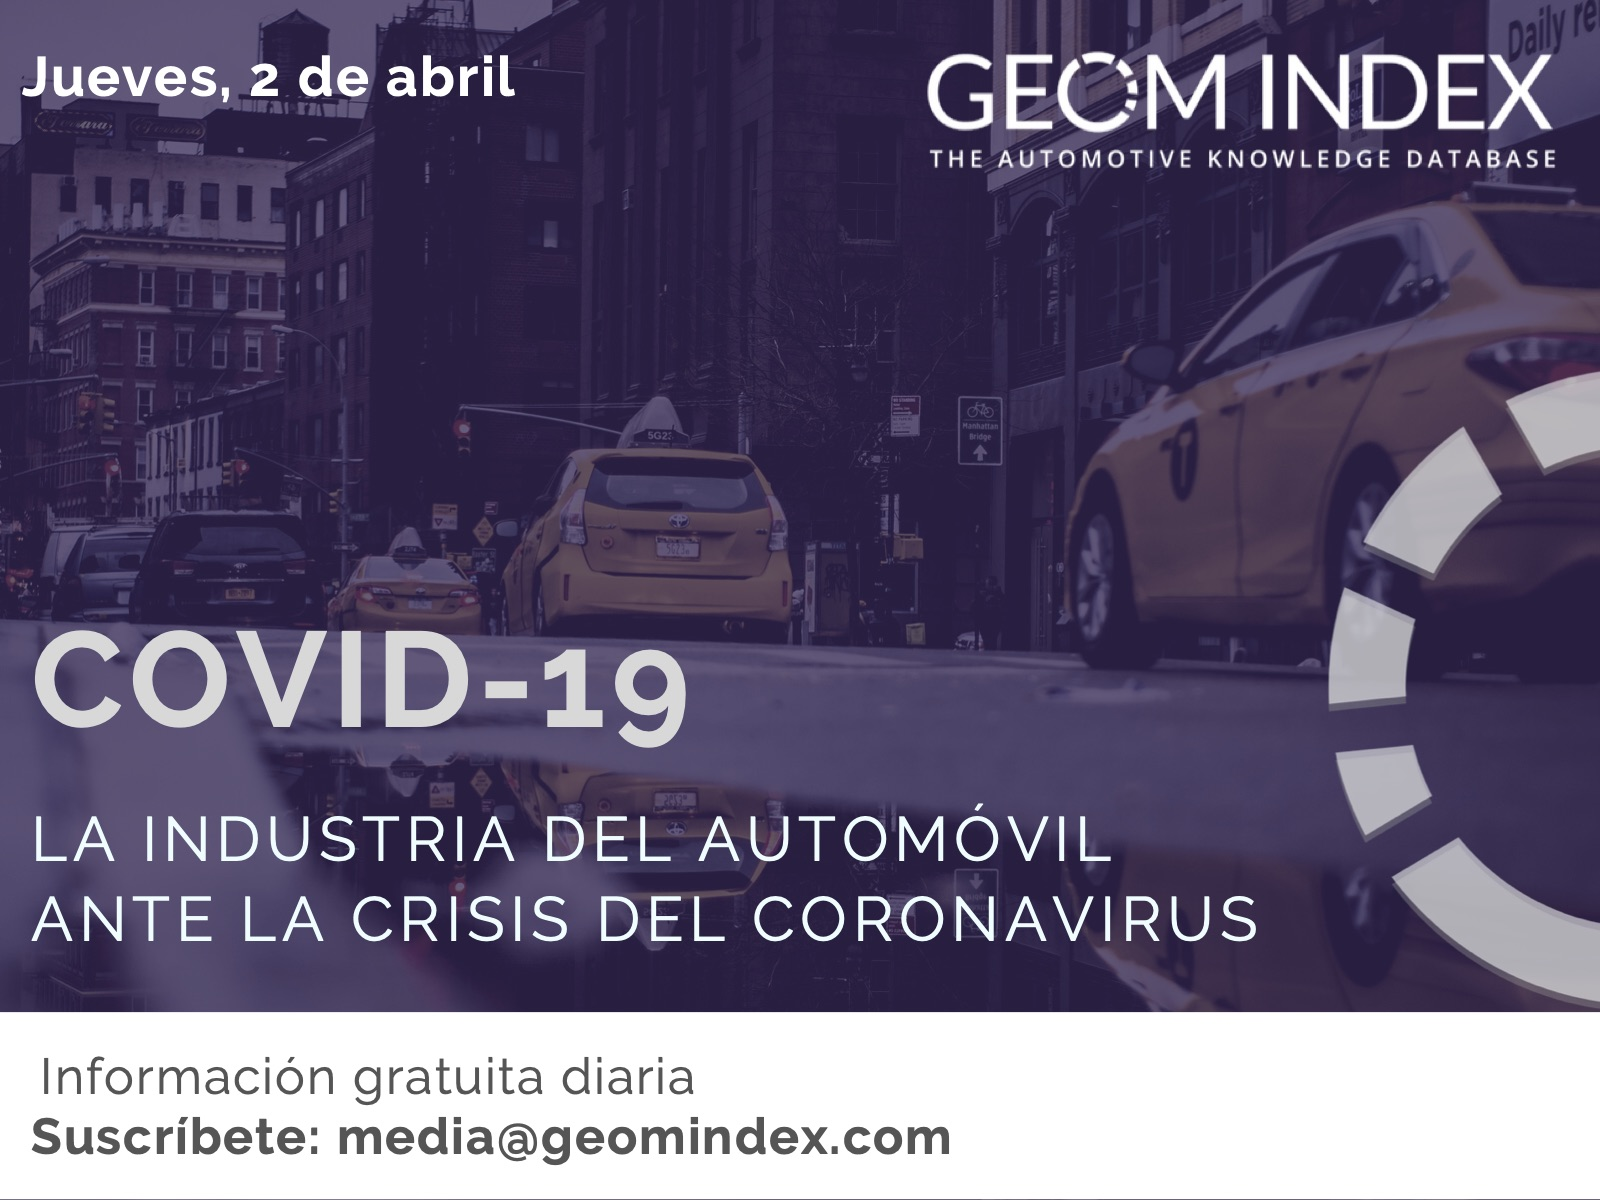 Informe 2/04/2020 – La industria del automóvil ante la crisis del Covid-19